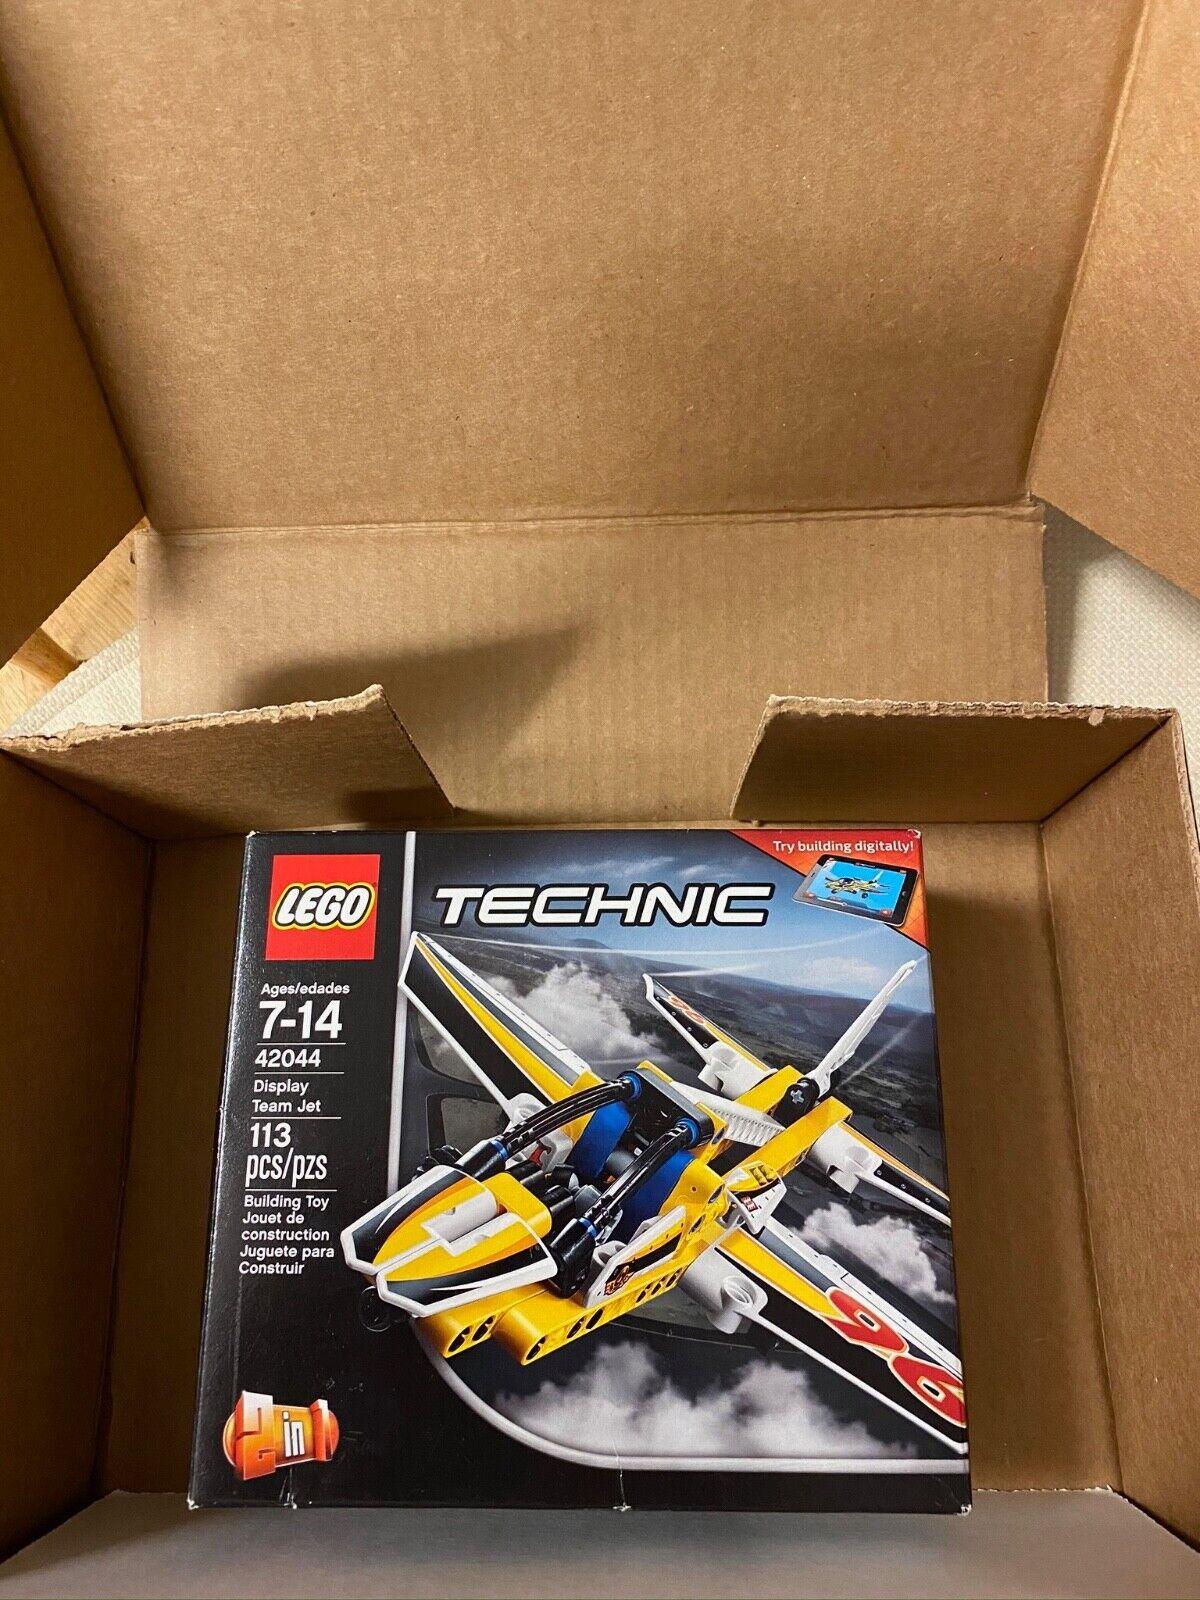 NEW LEGO Technic 42044 Display Team Jet - $10.00